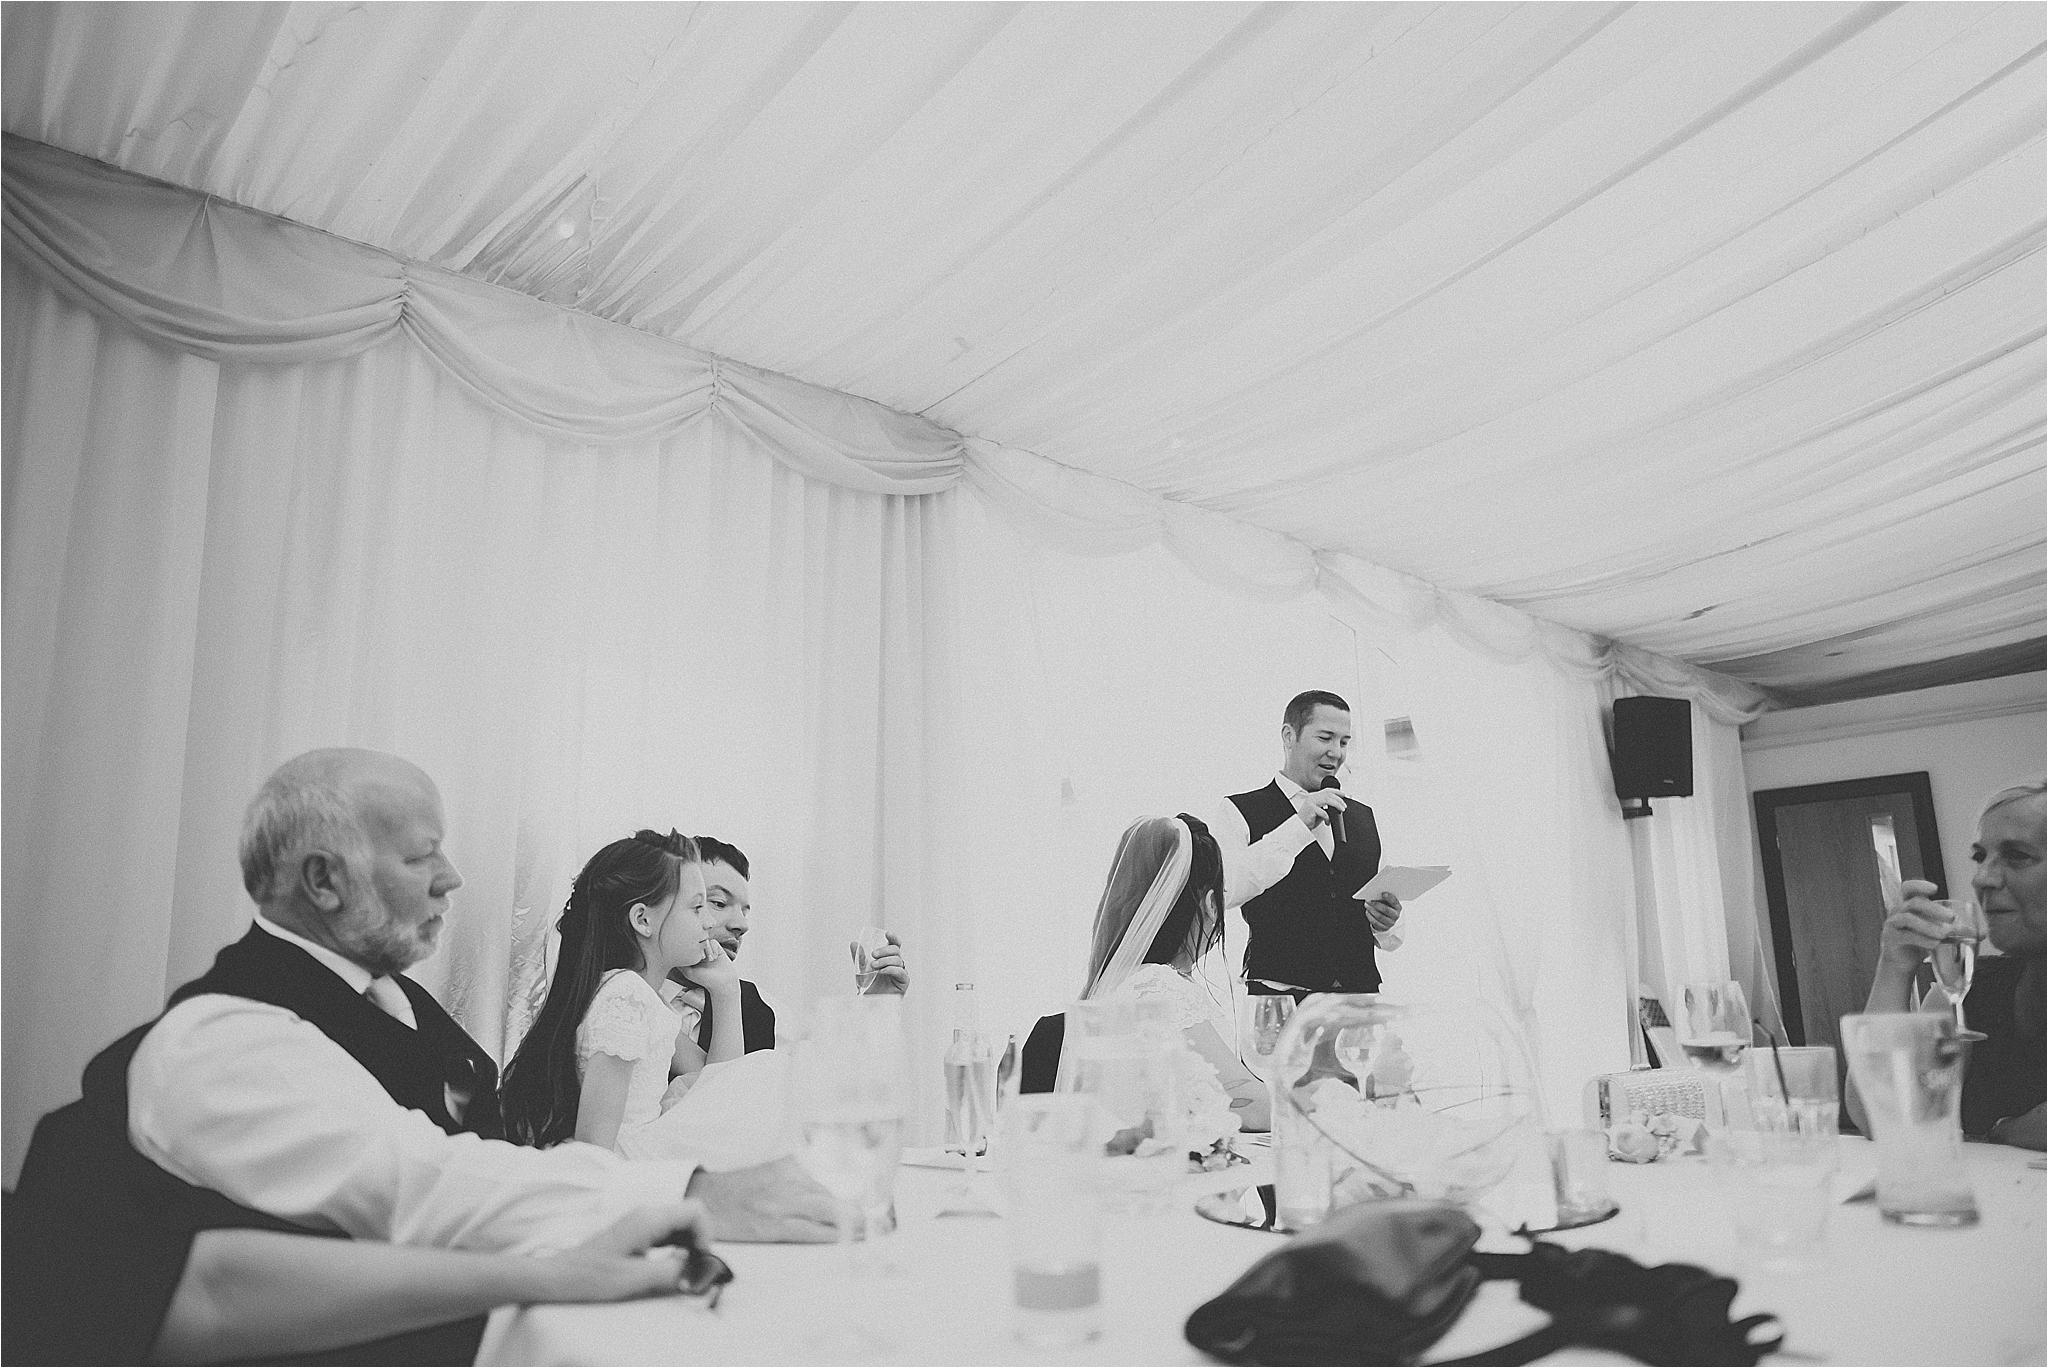 thevilla+lancashire+wreagreen+wedding+photographer107.jpg